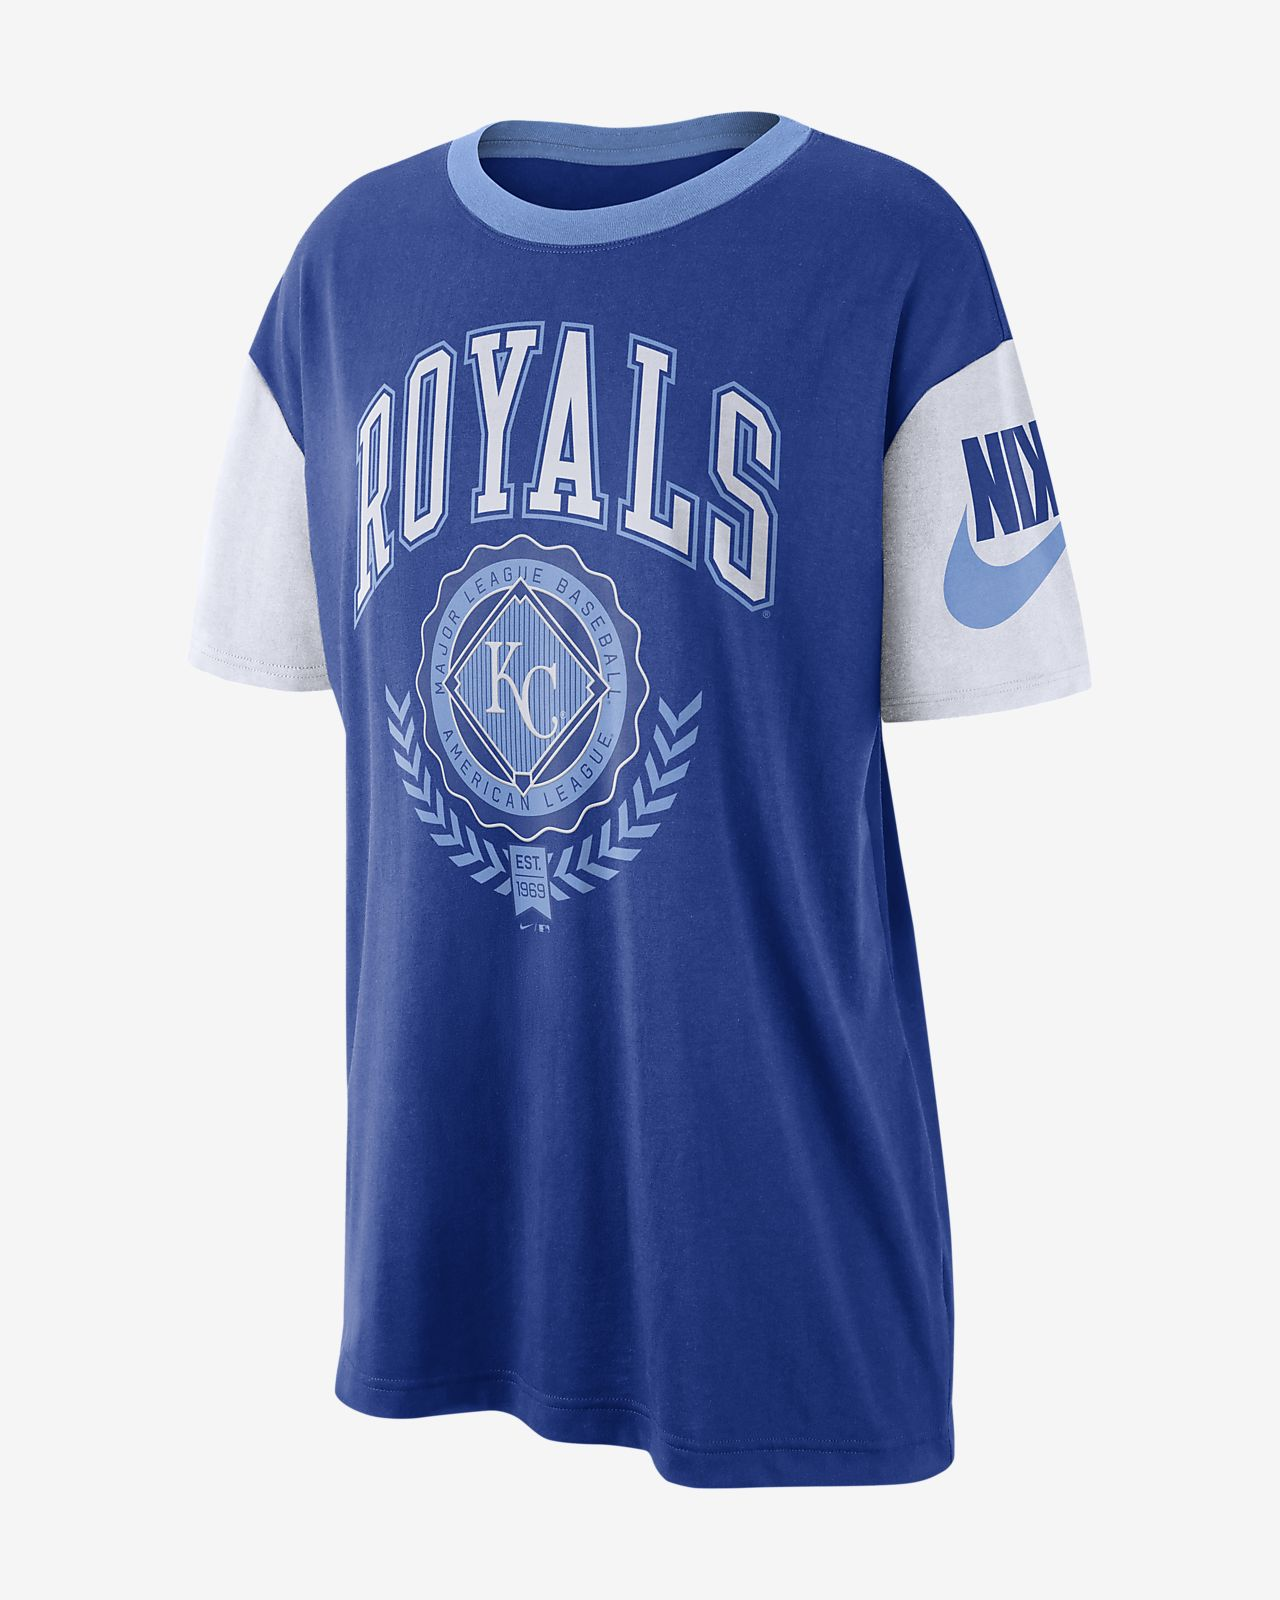 Nike (MLB Royals) Women's T-Shirt